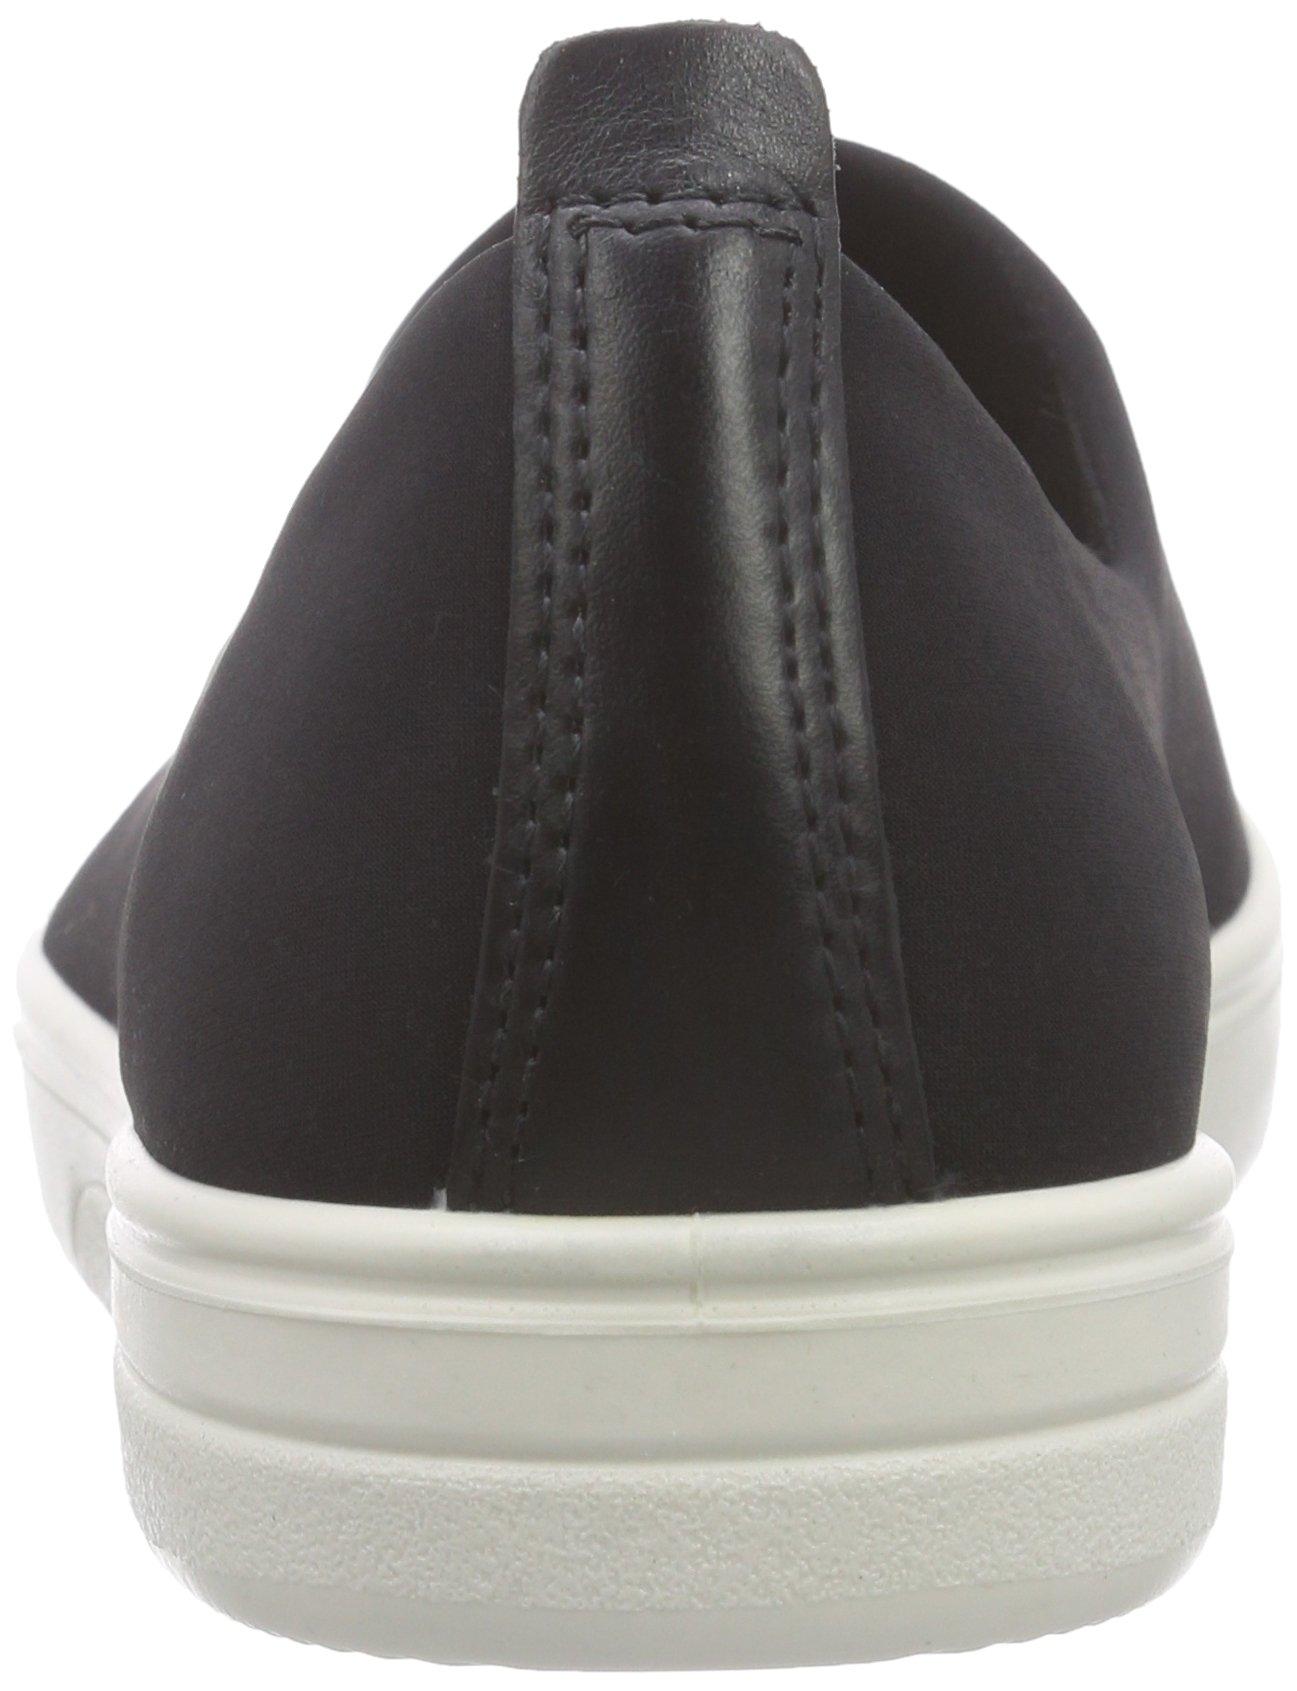 Ecco Footwear Womens Fara Slip-On Loafer, Black/Black, 42 EU/11-11.5 M US by ECCO (Image #2)